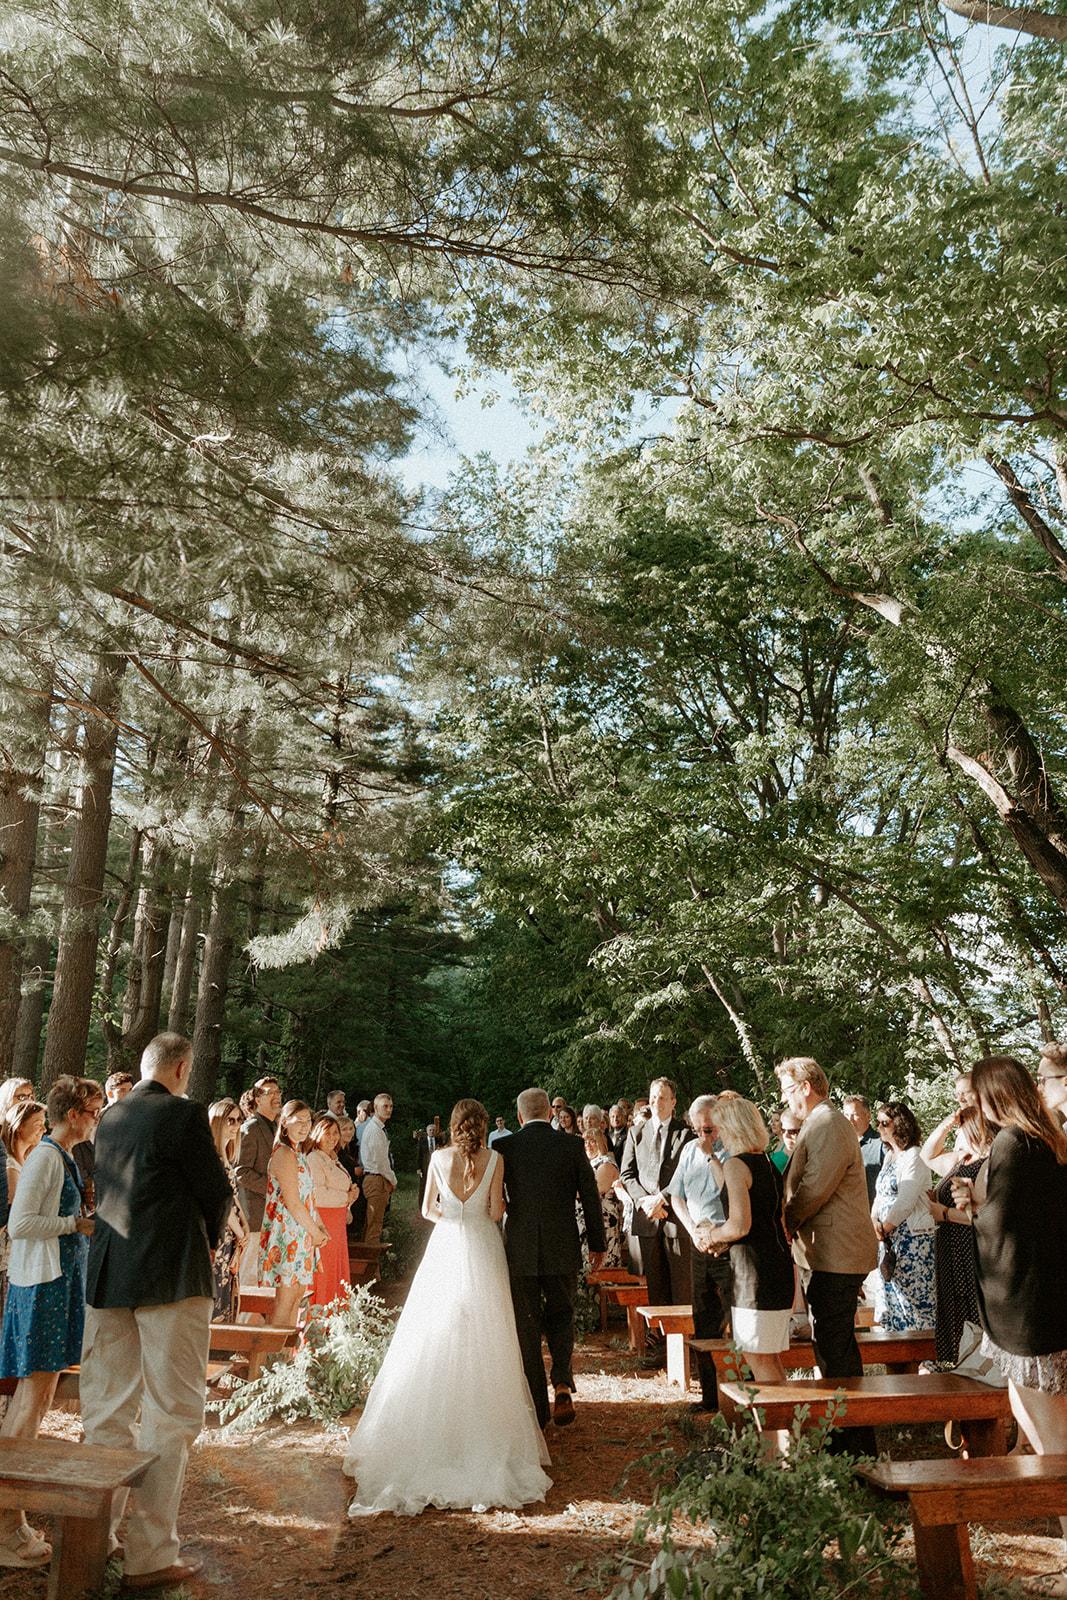 camp_wokanda_peoria_illinois_wedding_photographer_wright_photographs_bliese_0201.jpg